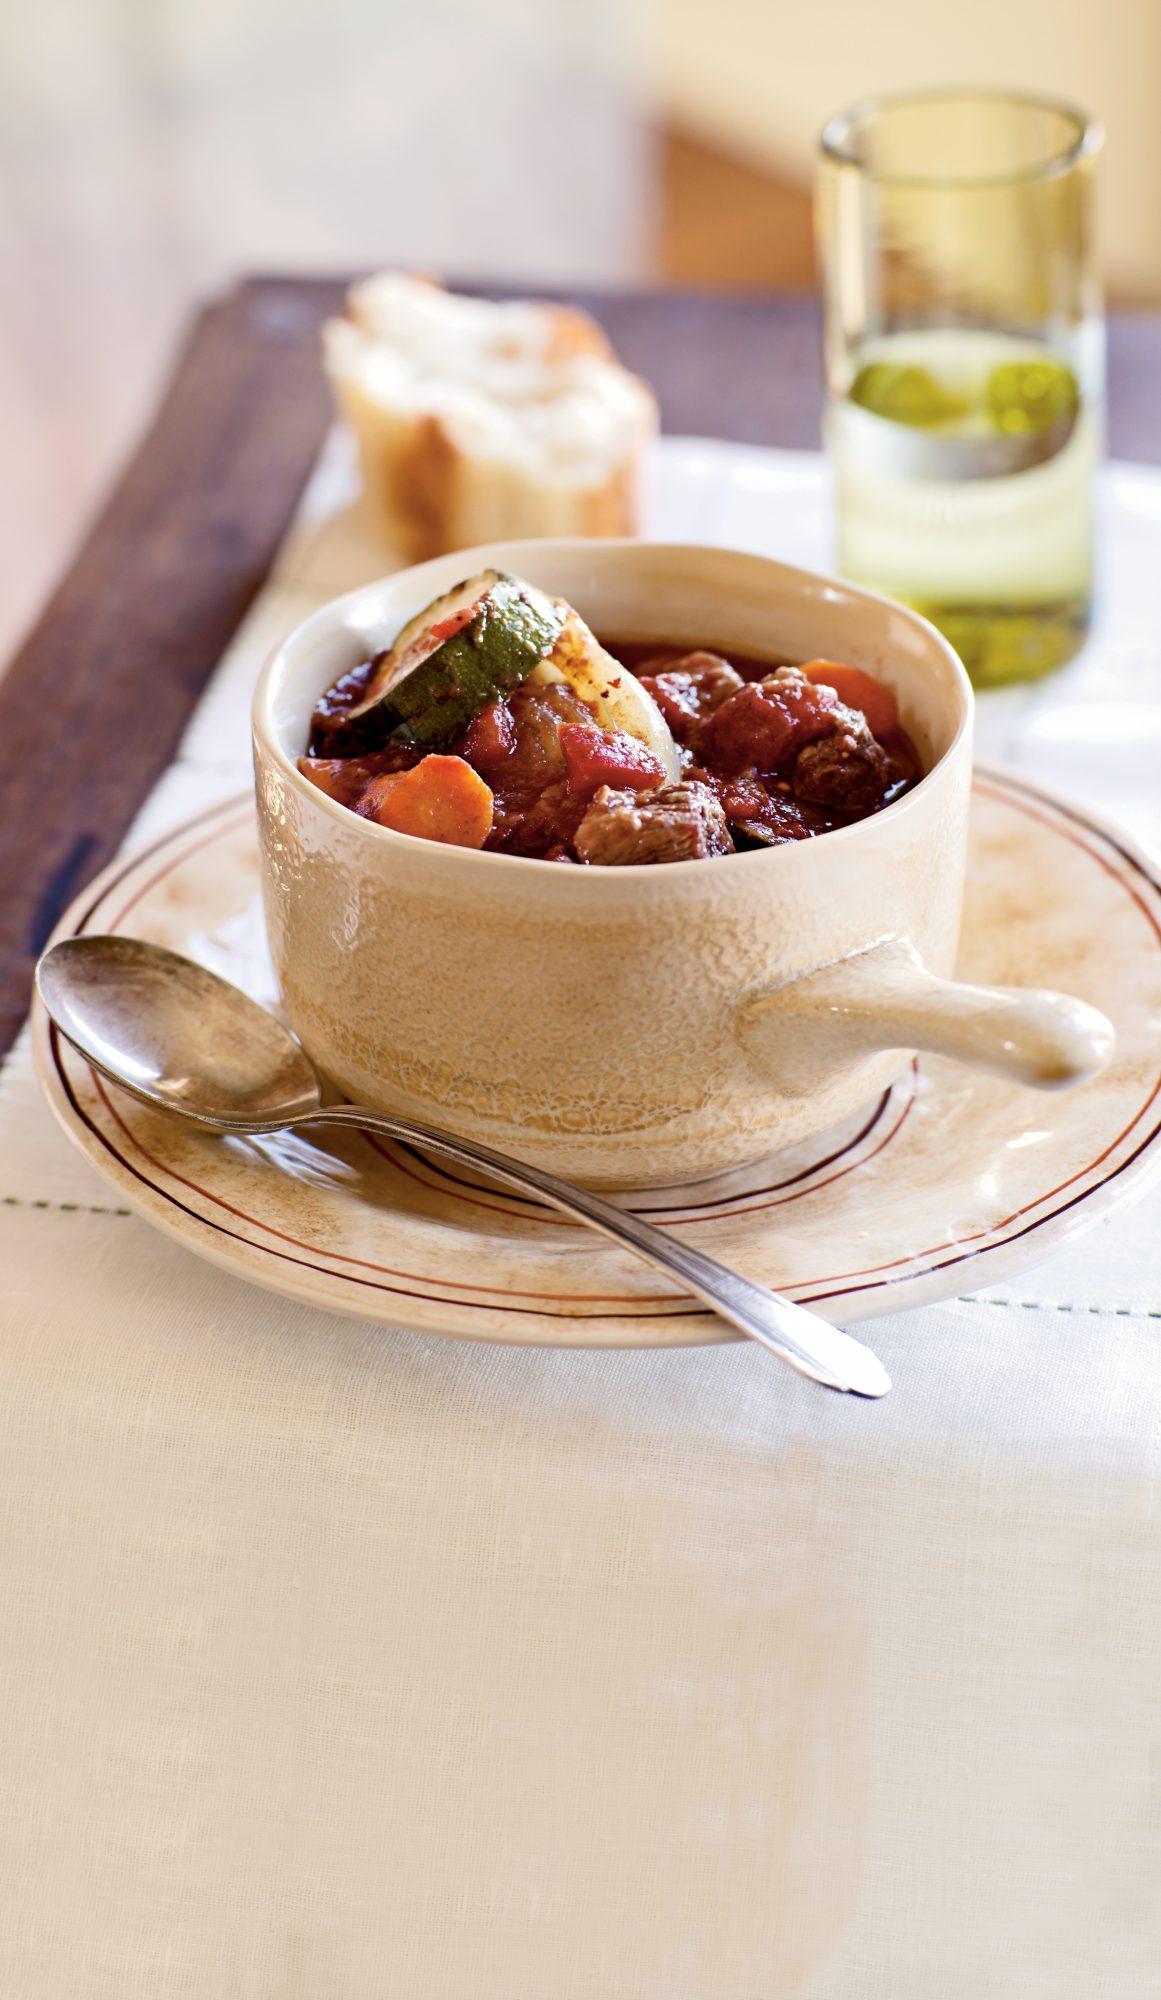 Provençal Beef Stew